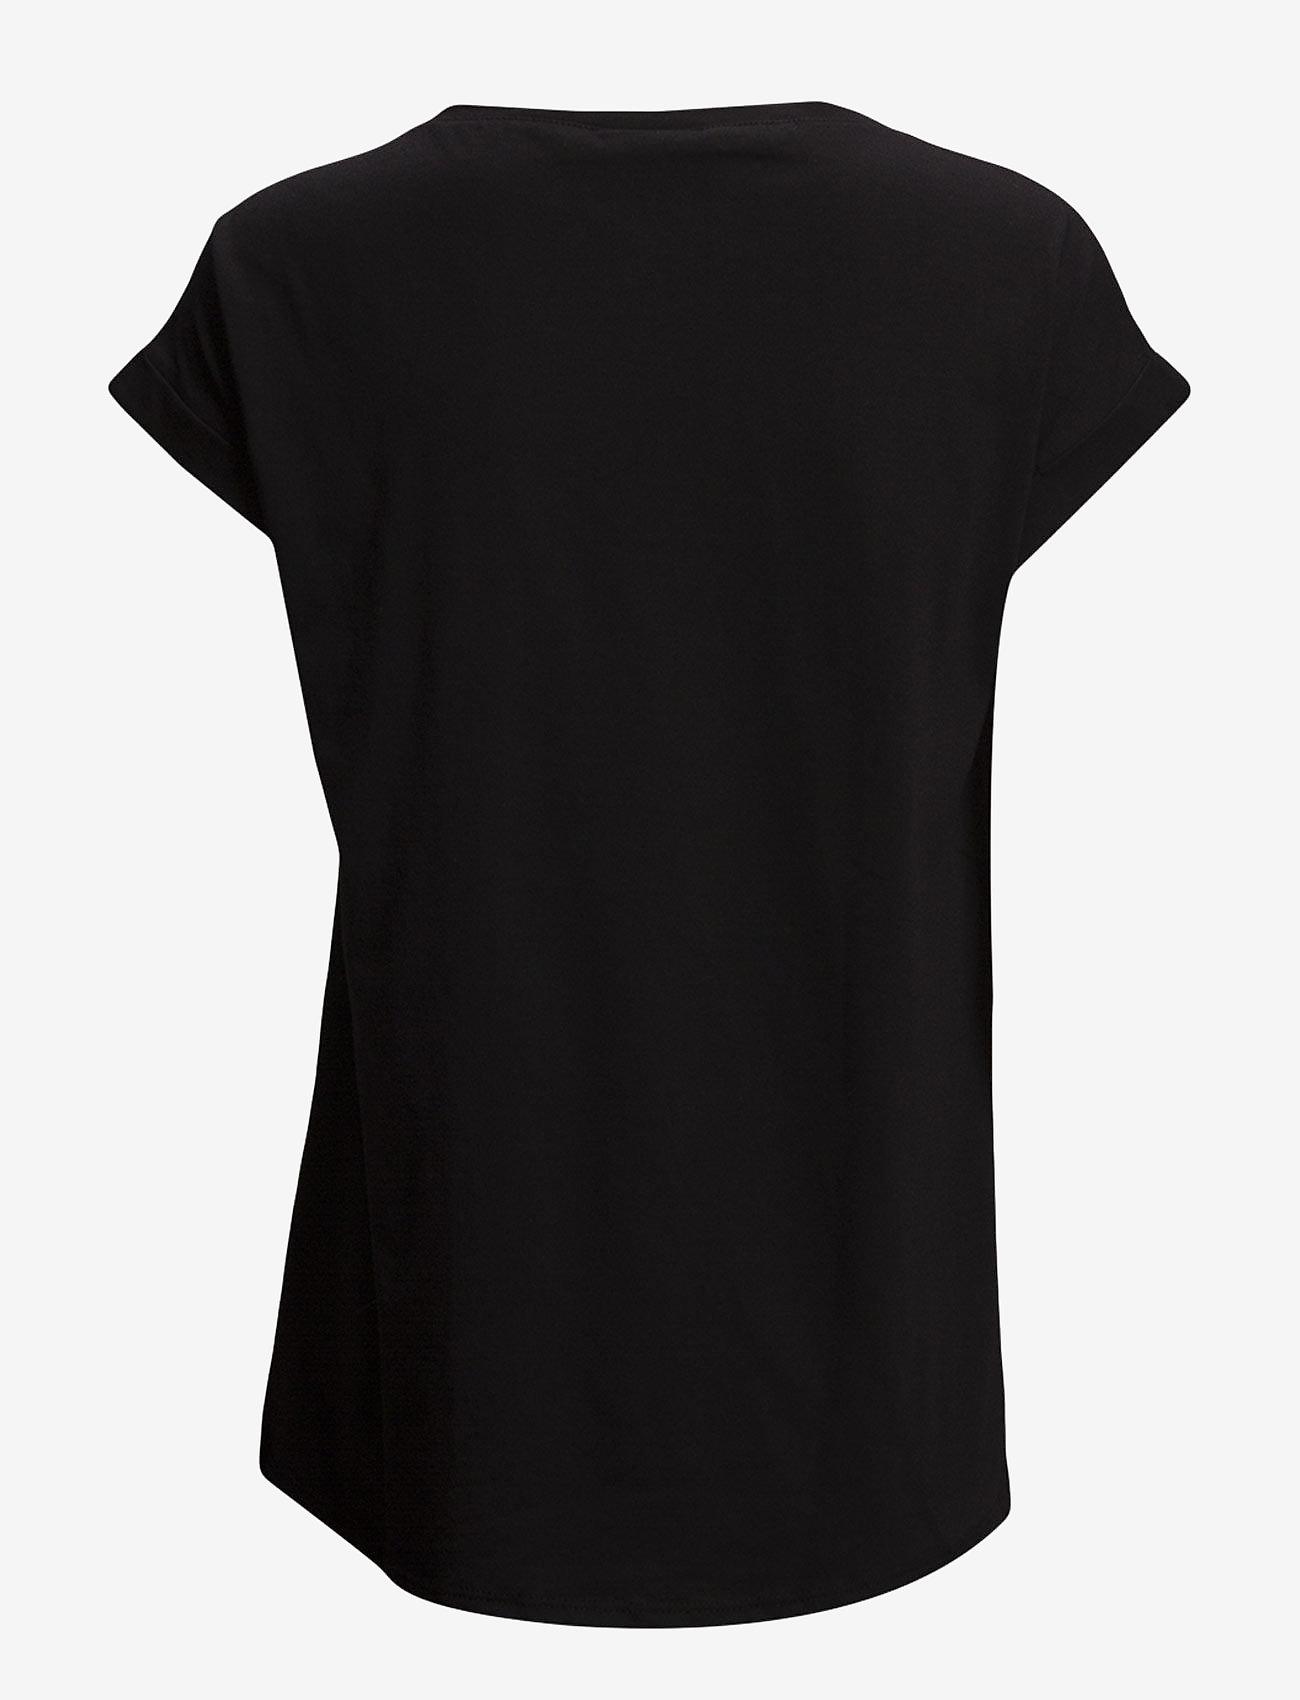 Vila - VIDREAMERS PURE T-SHIRT-NOOS - basic t-shirts - black - 1